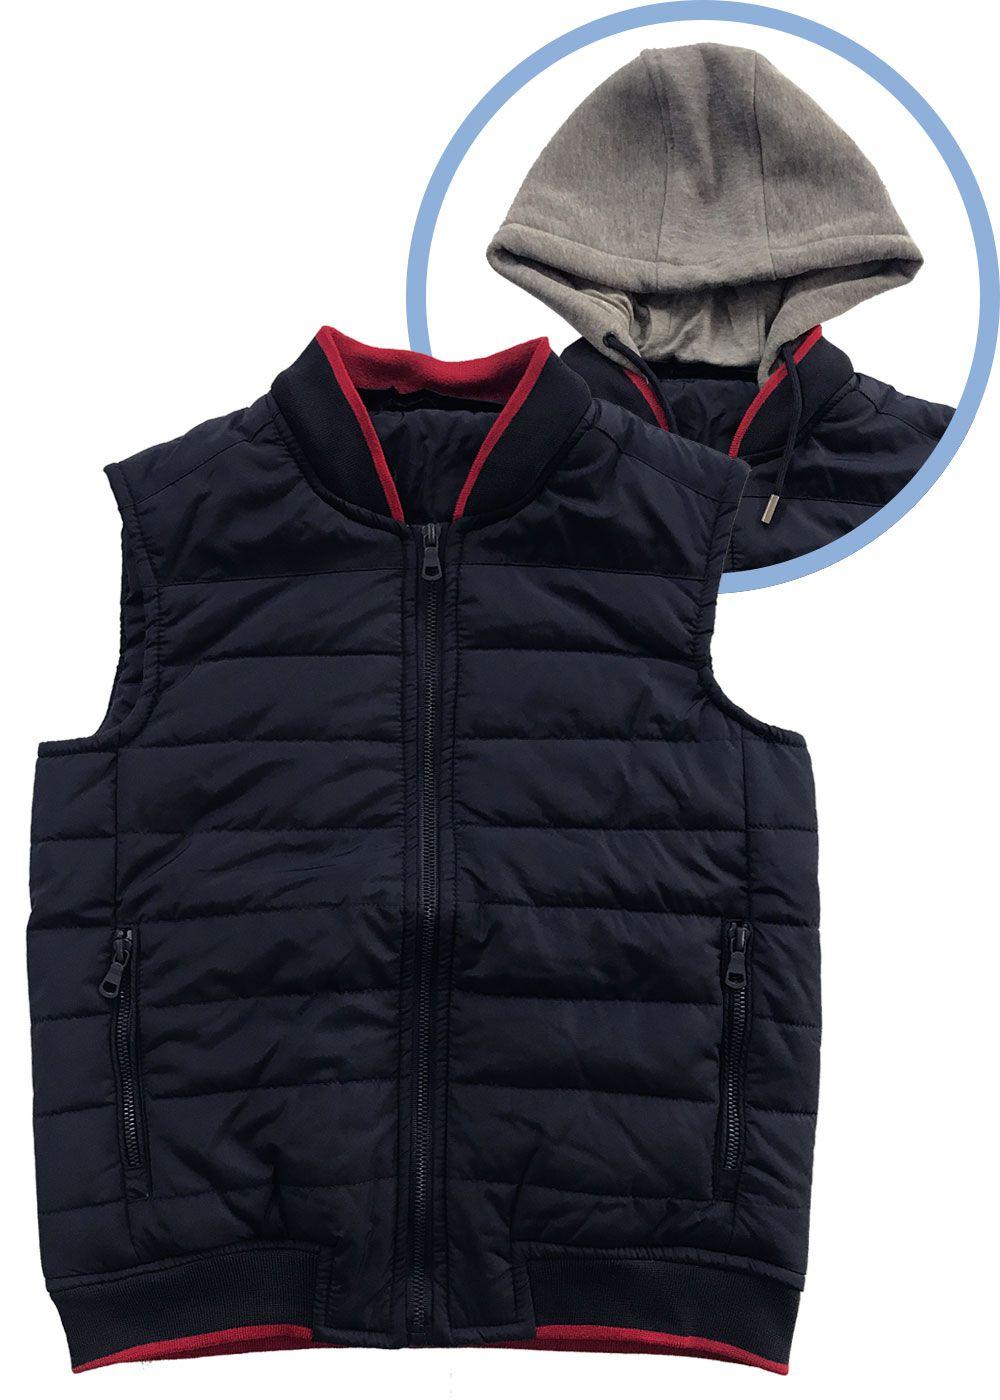 Colete Infantil Masculino Inverno Azul Yacht Master